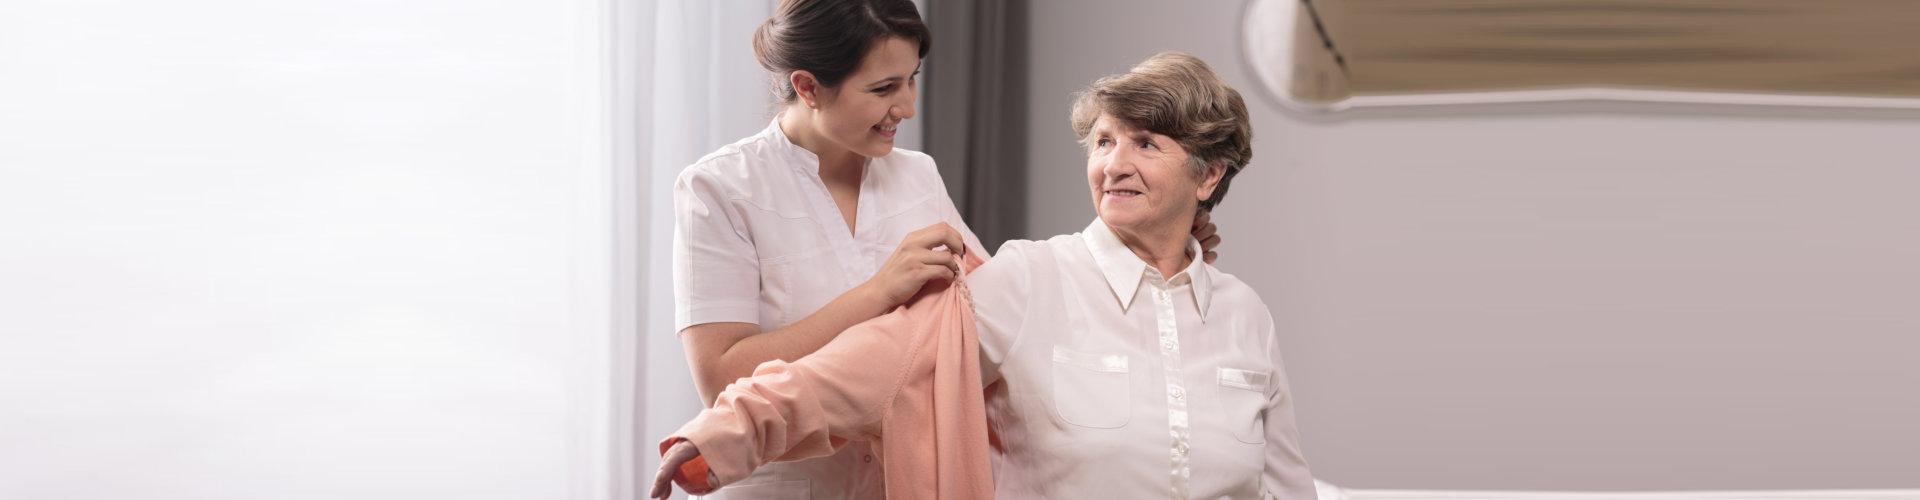 caregiver helping senior woman get dressed